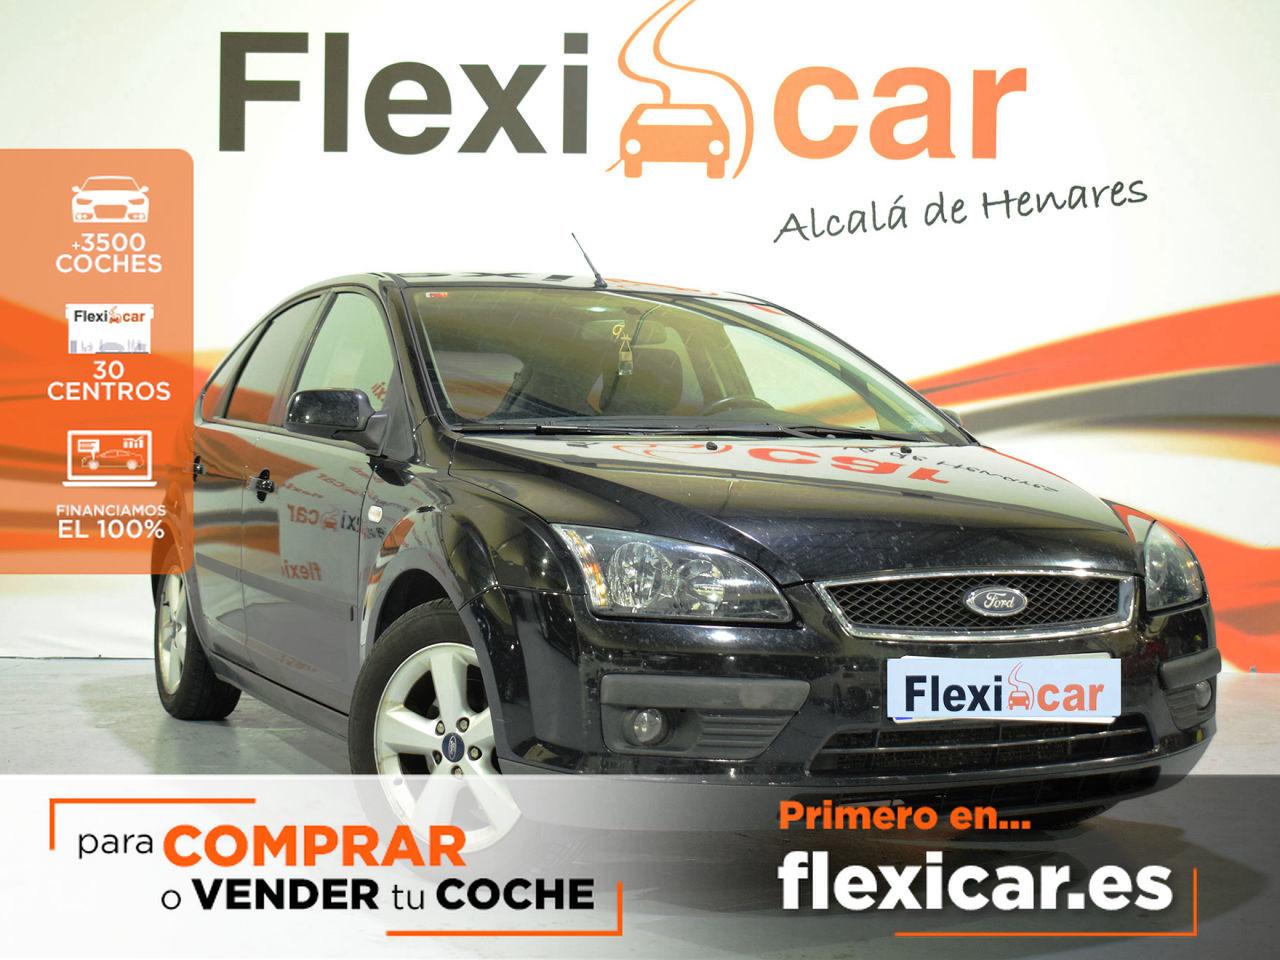 Ford Focus ocasión segunda mano 2005 Gasolina por 3.490€ en Madrid